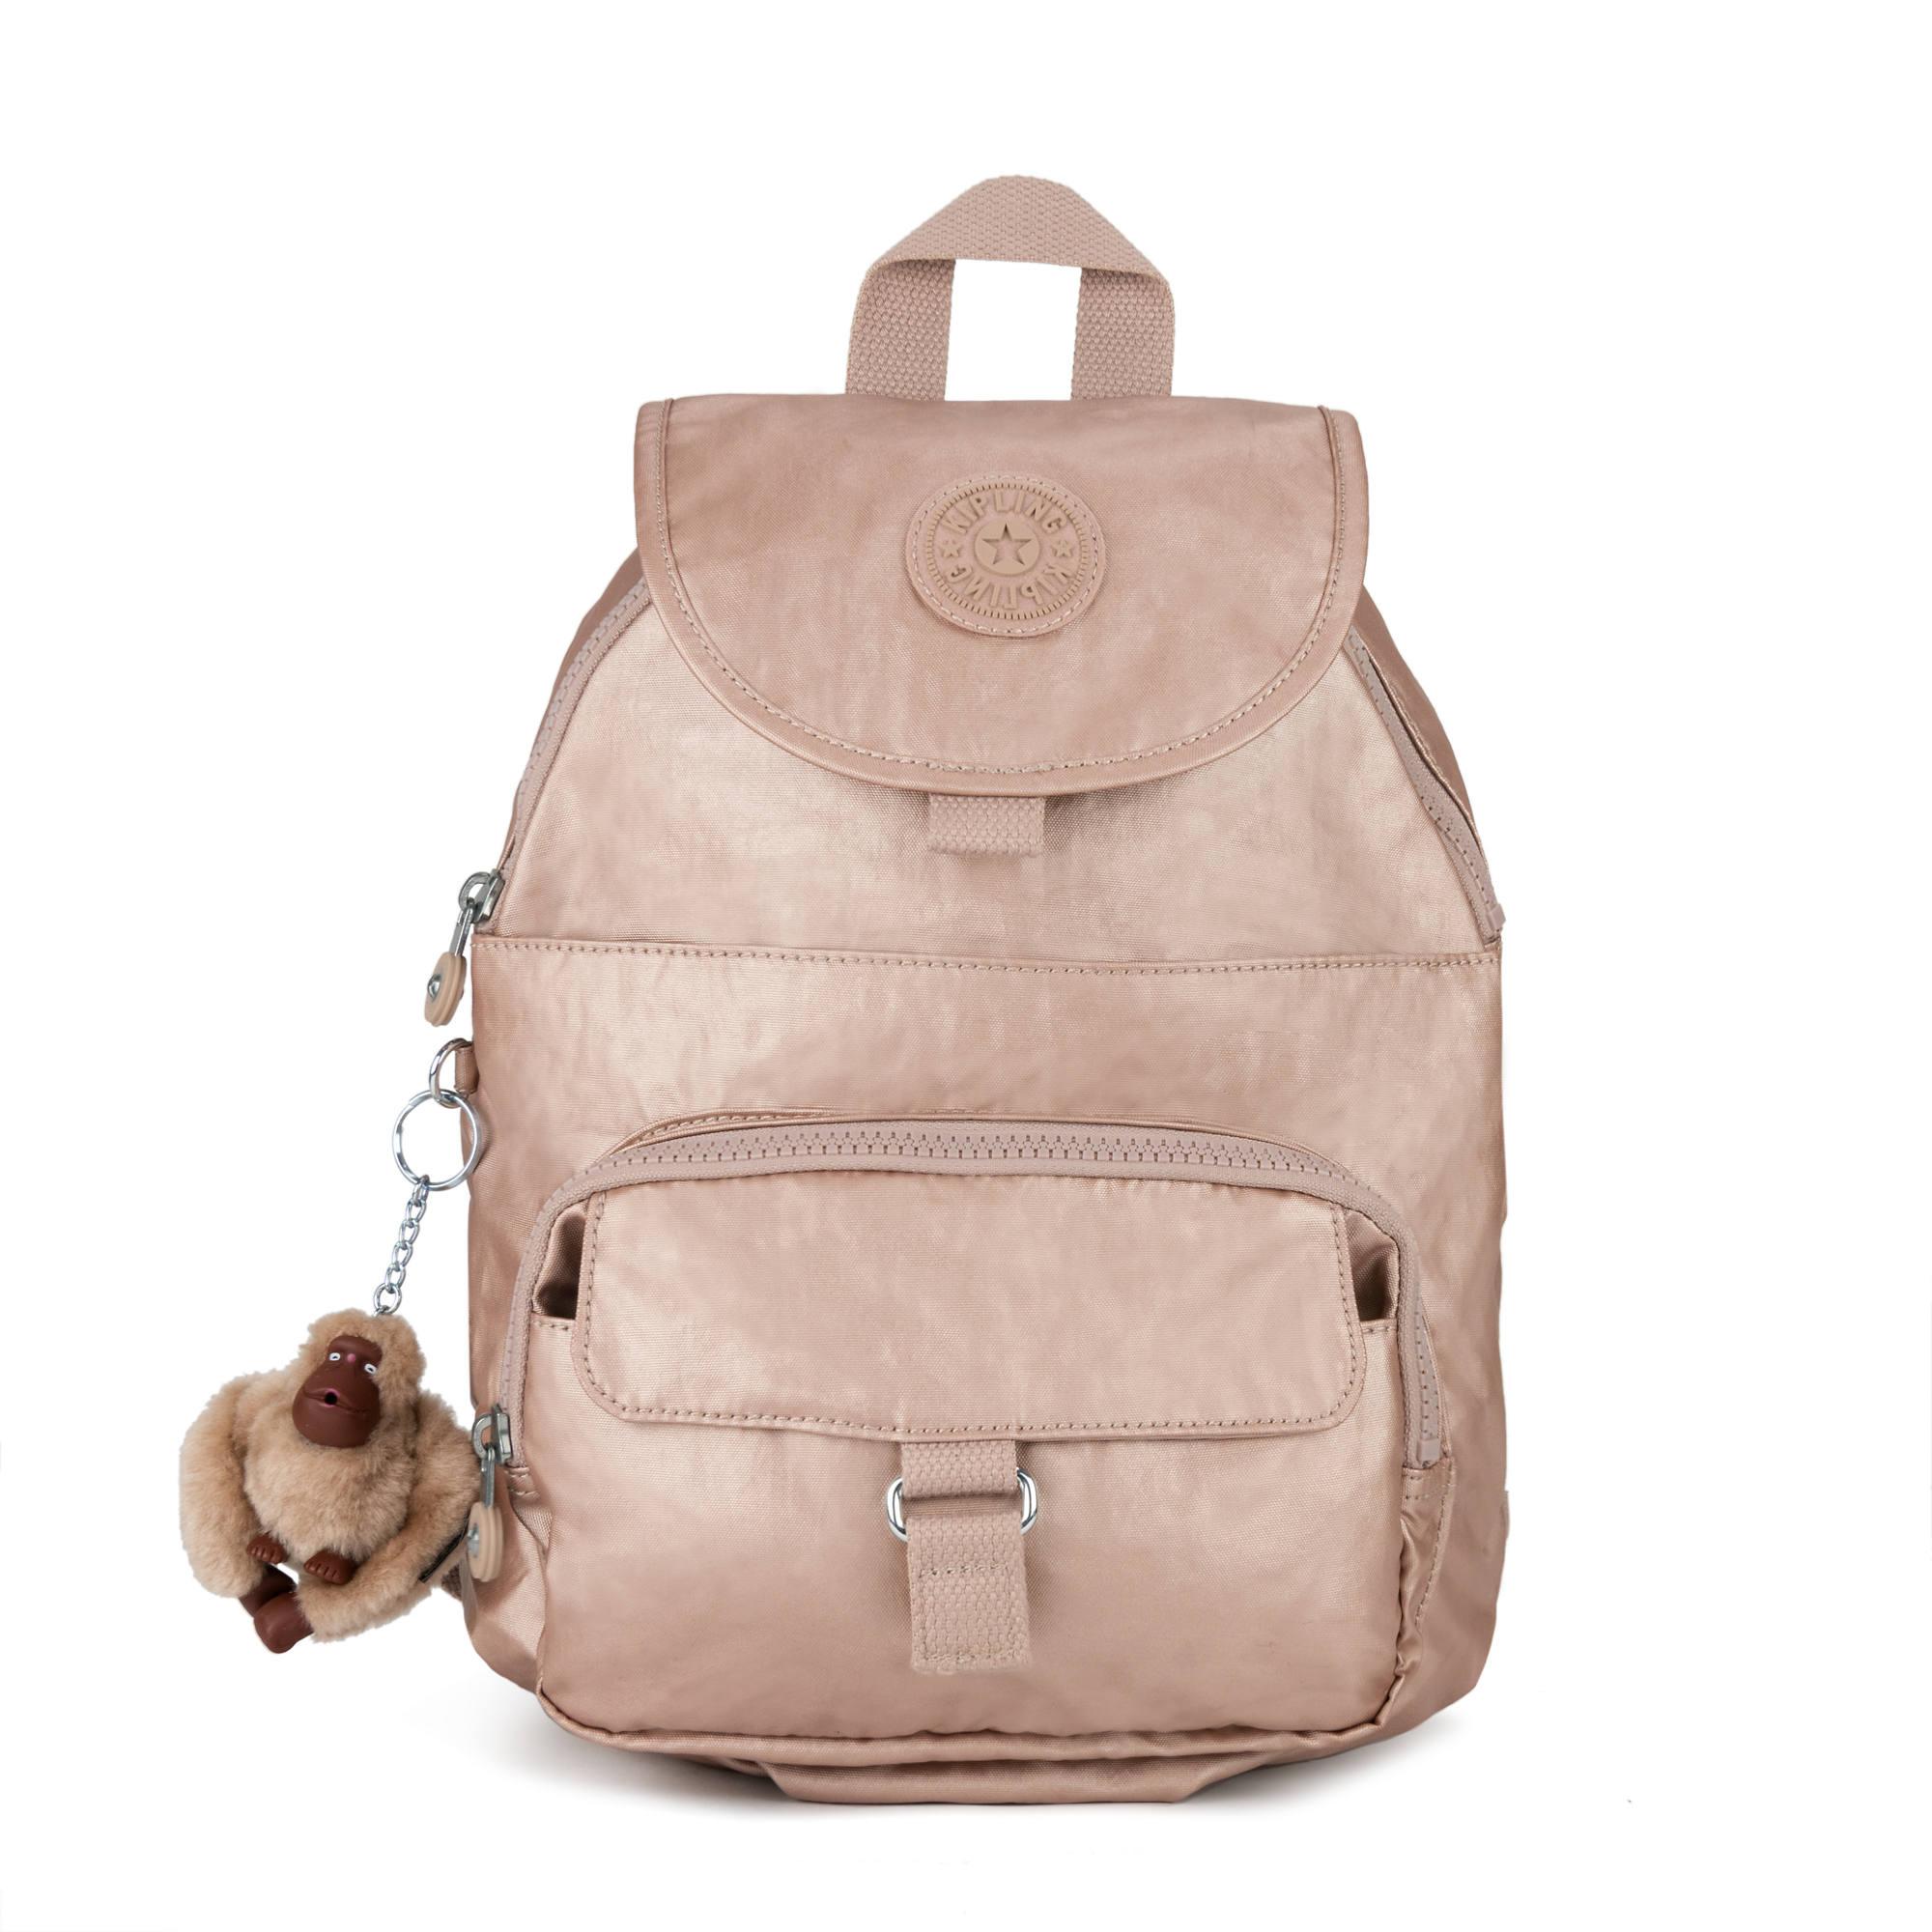 1ec176e24e Queenie Metallic Small Backpack